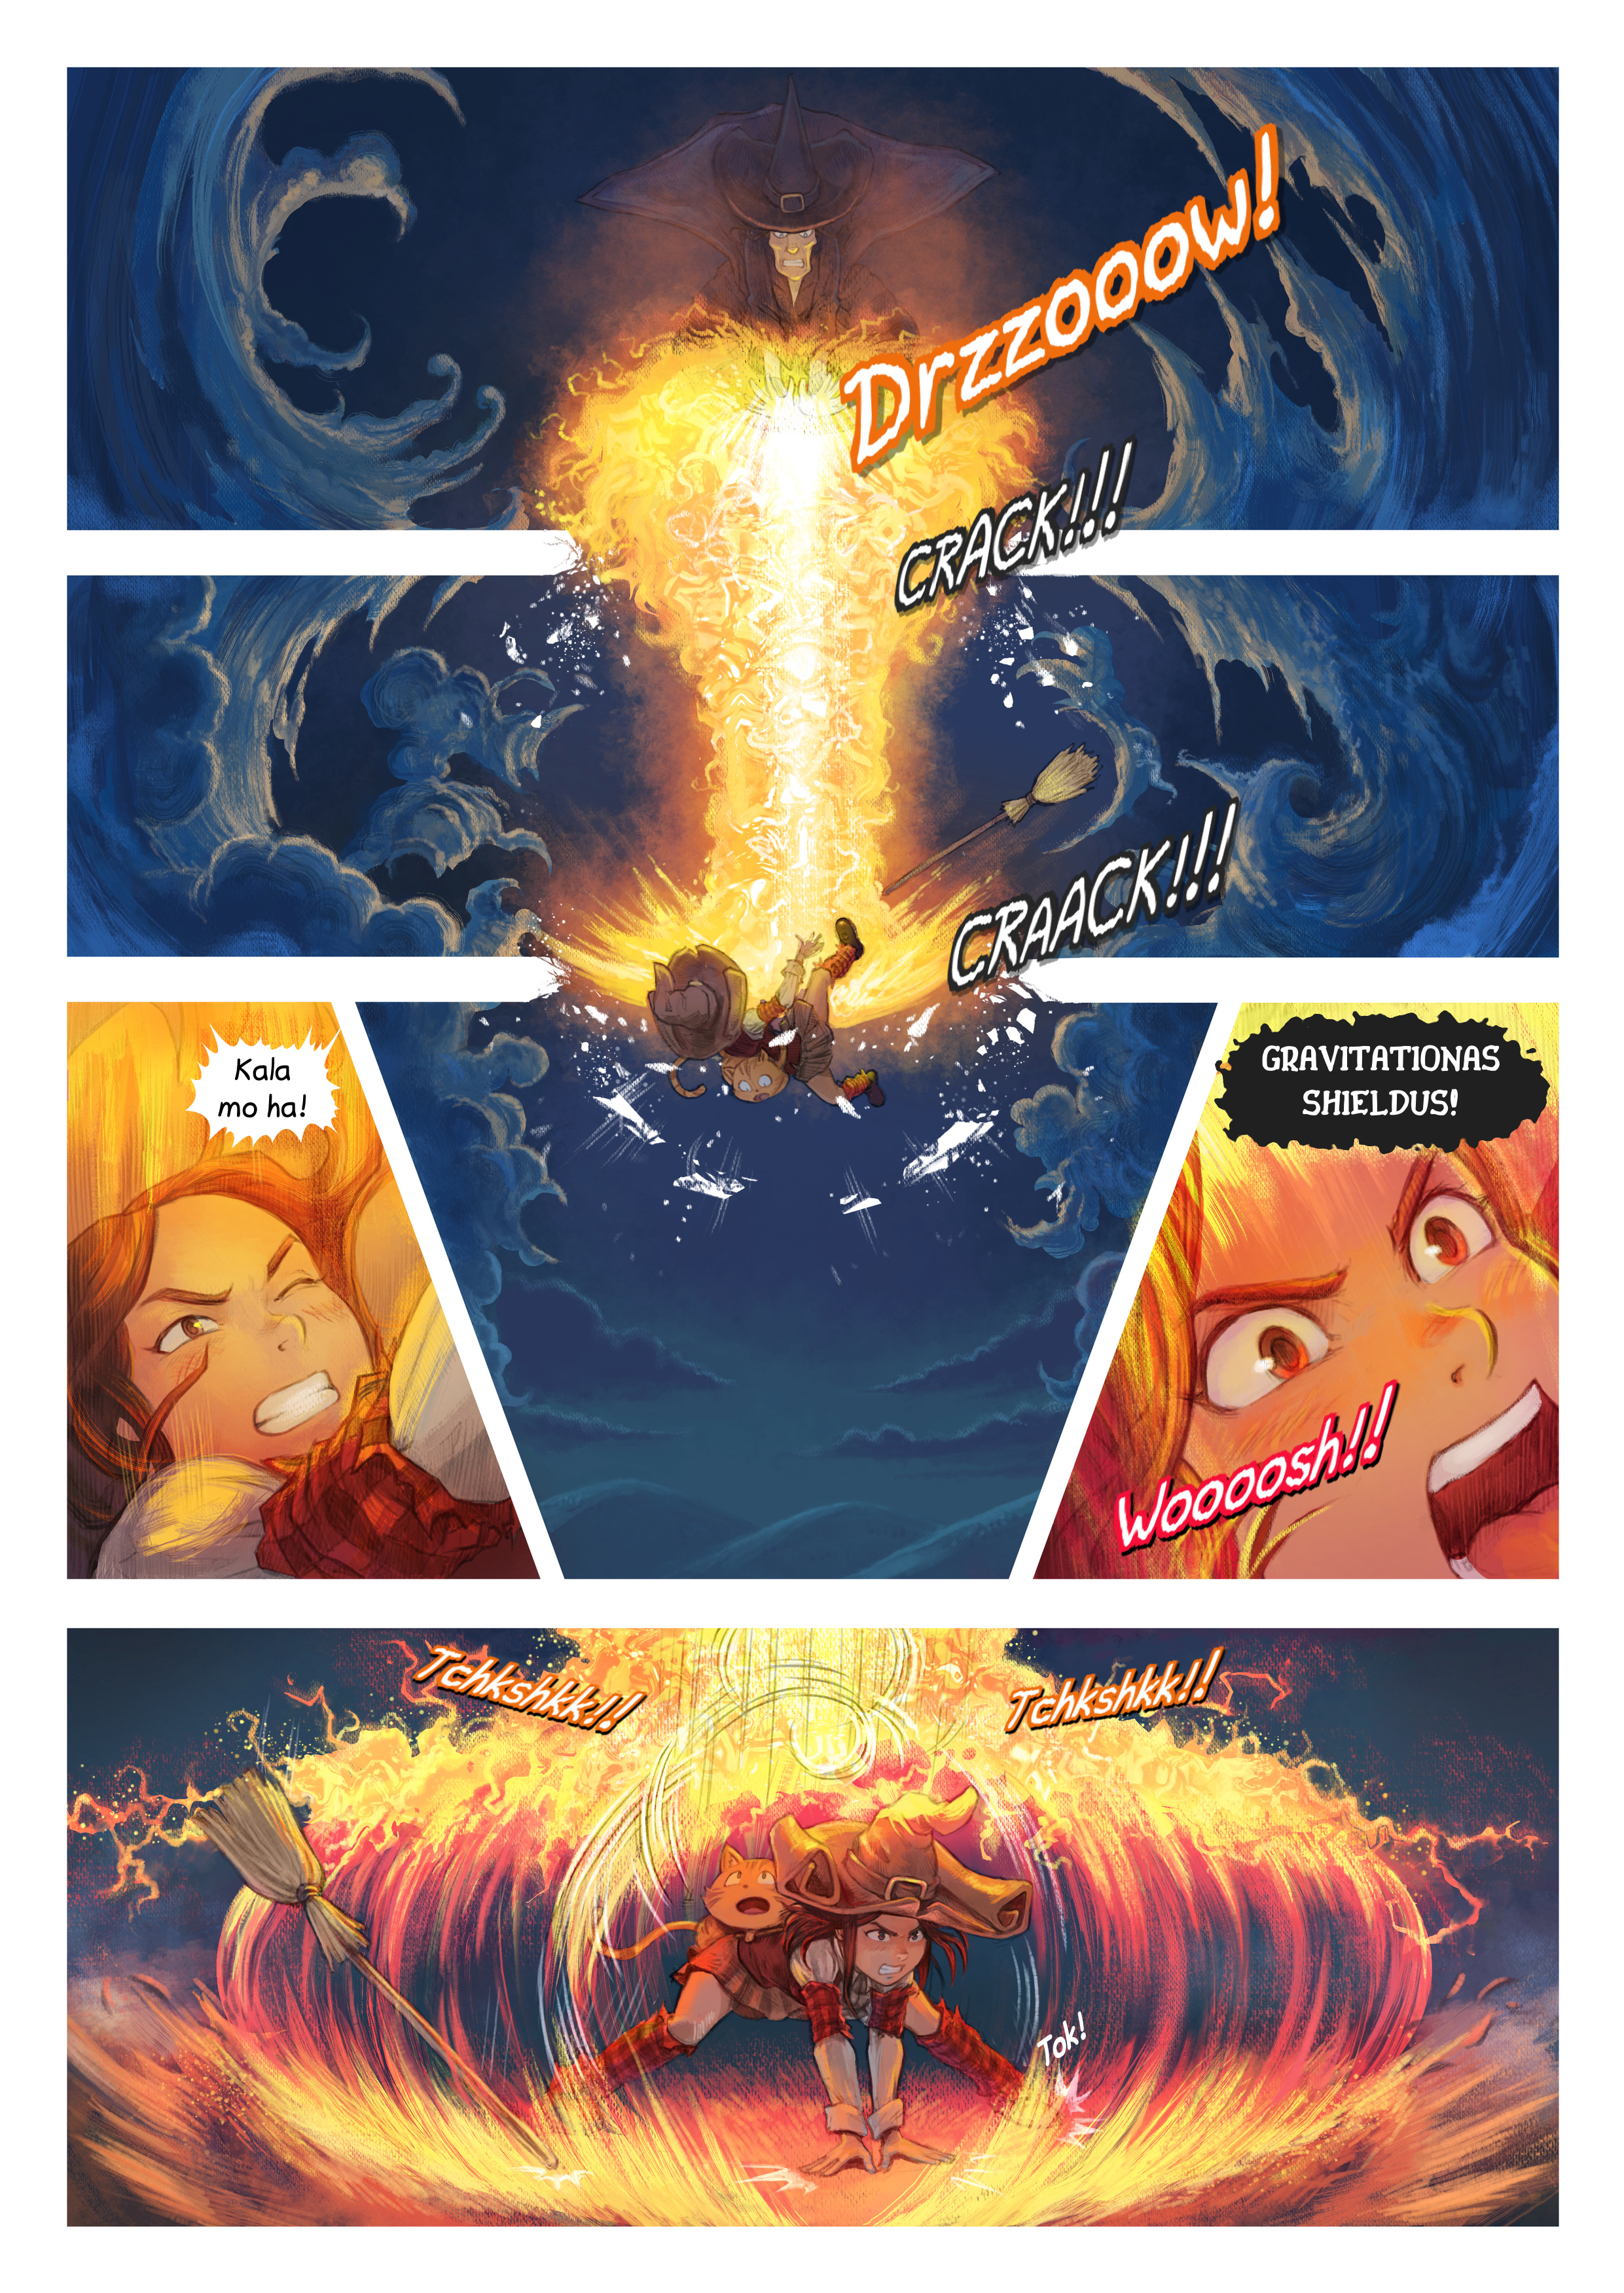 Episode 31: Matira Matibay, Page 2